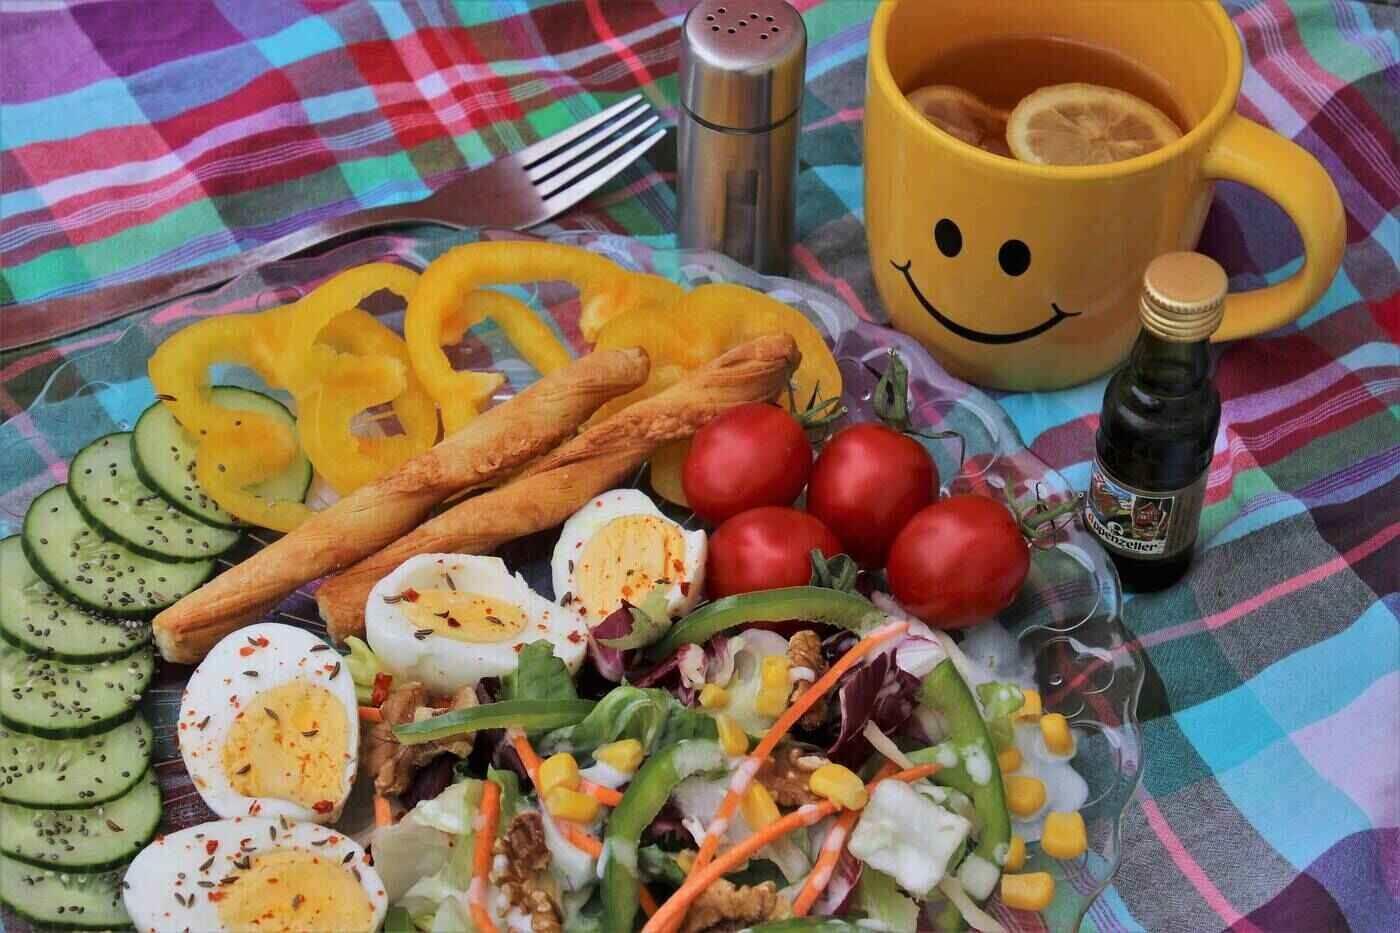 Tea, vegetables and egg slices